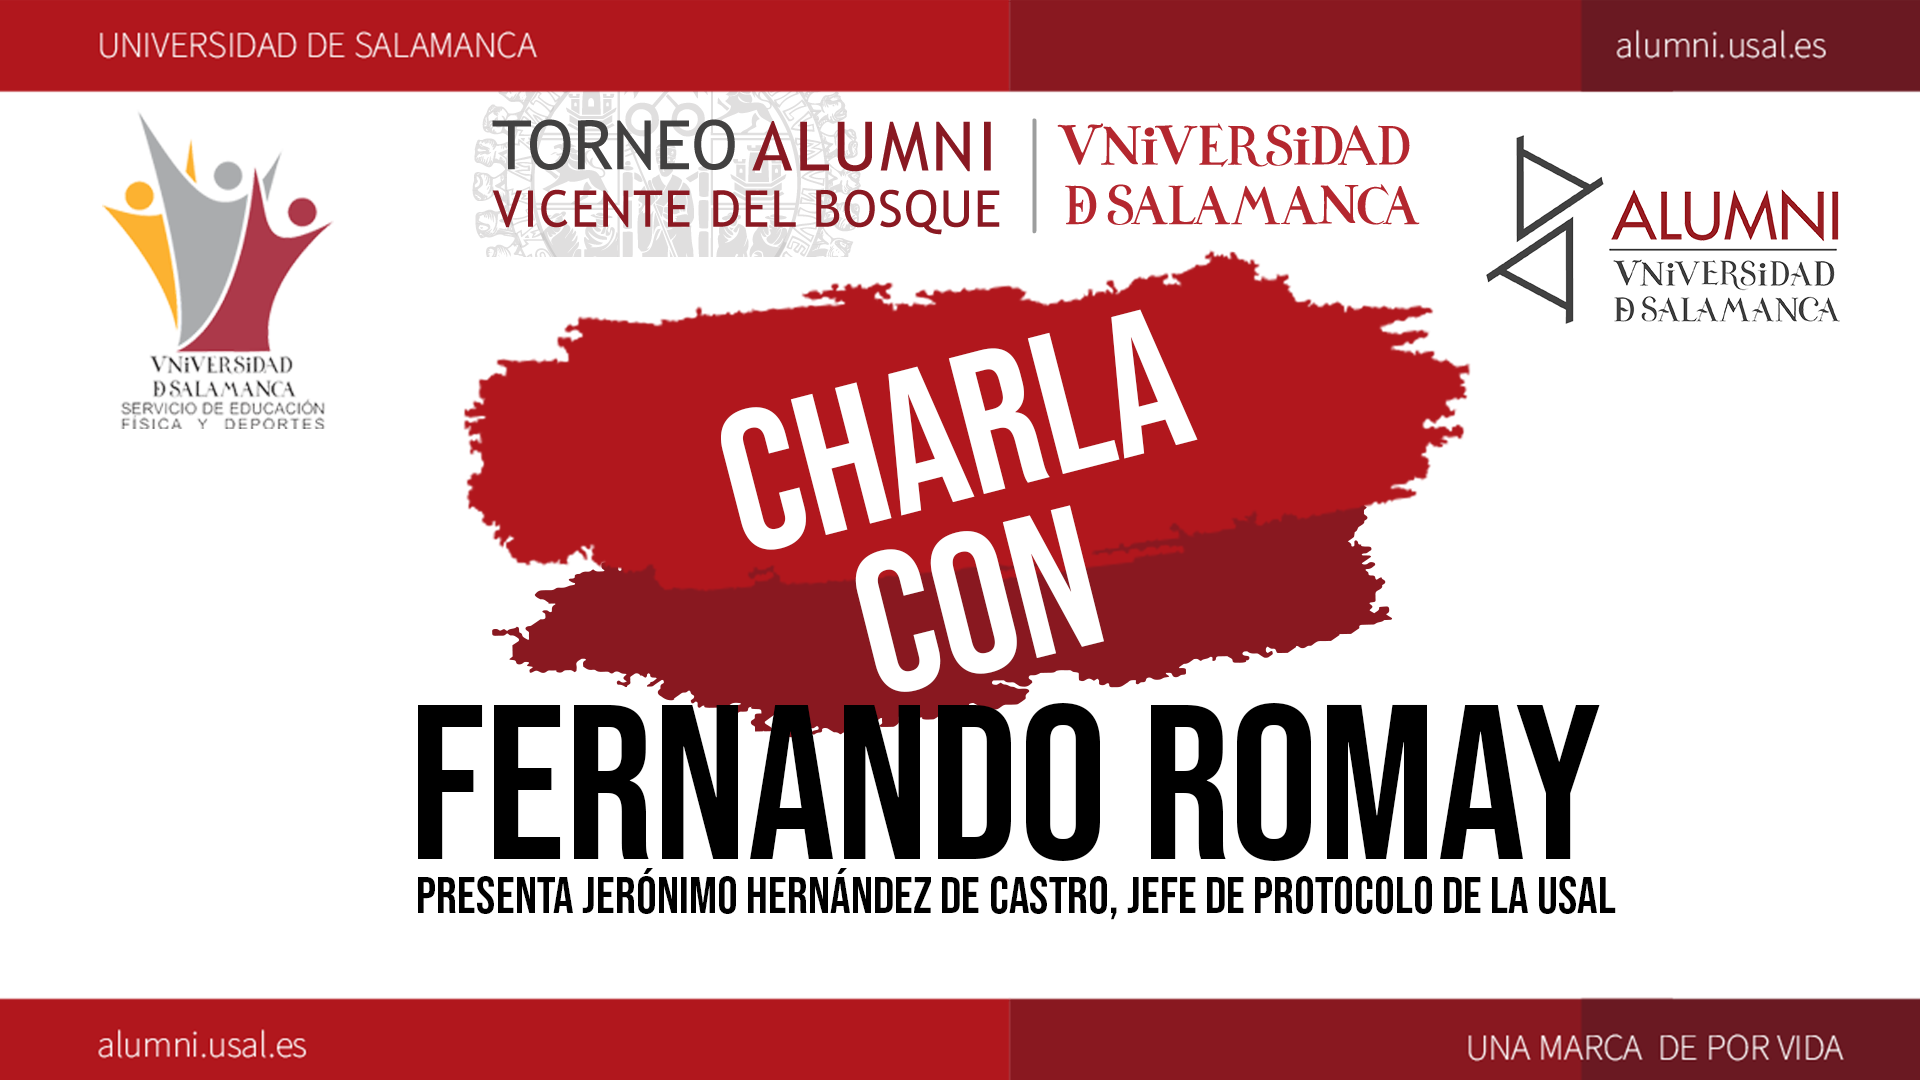 Charla con Fernando Romay